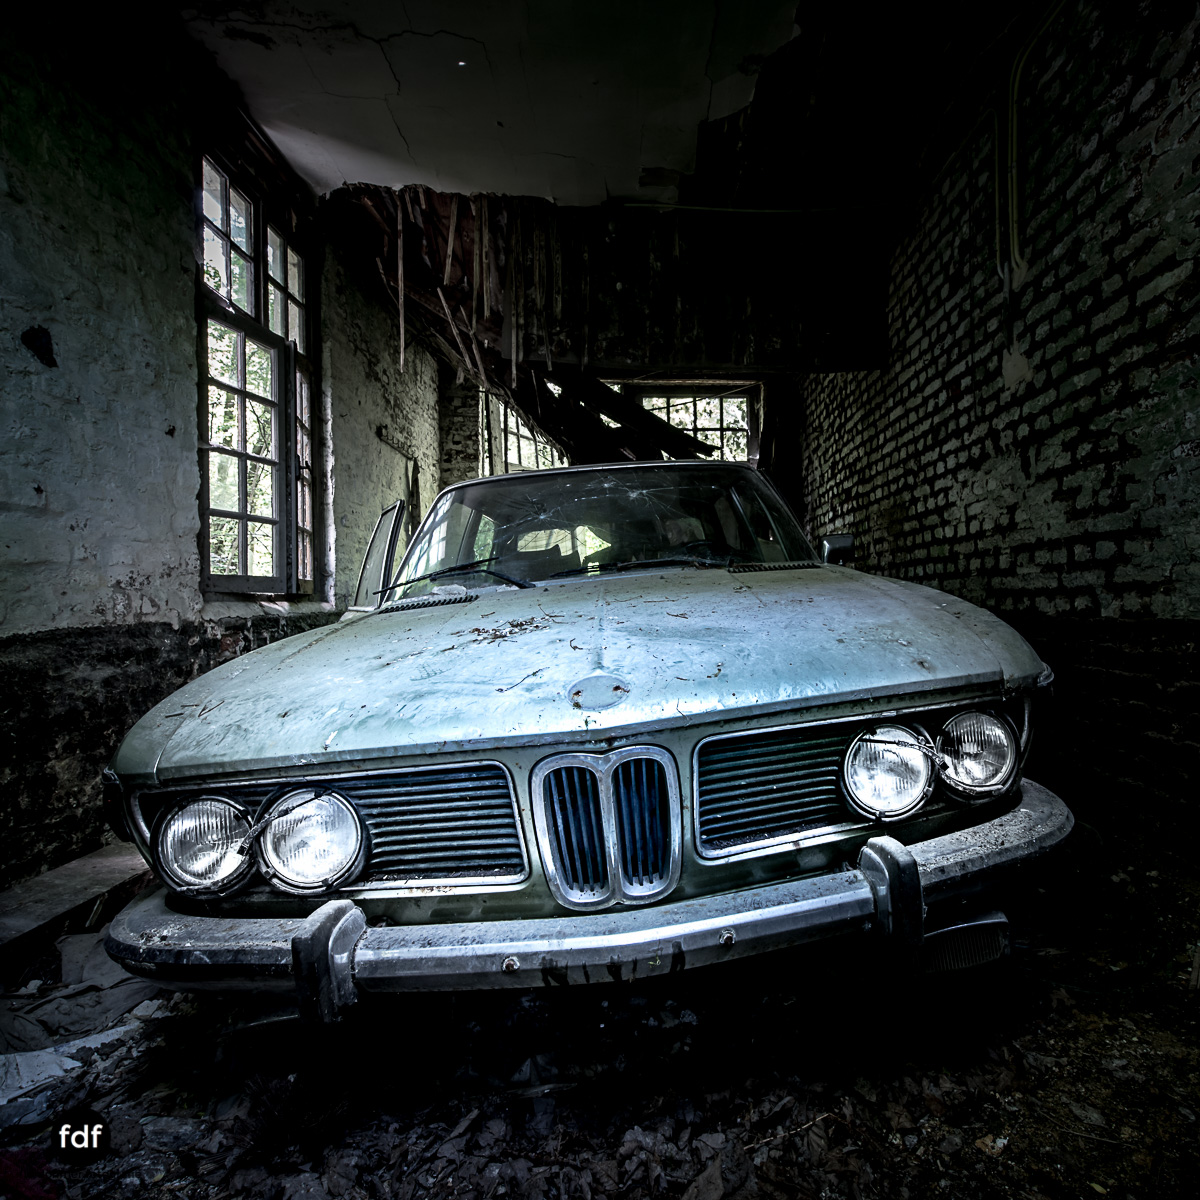 Villa BMW-Herrenhaus-Urbex-Lost-Place-Belgien-5.JPG